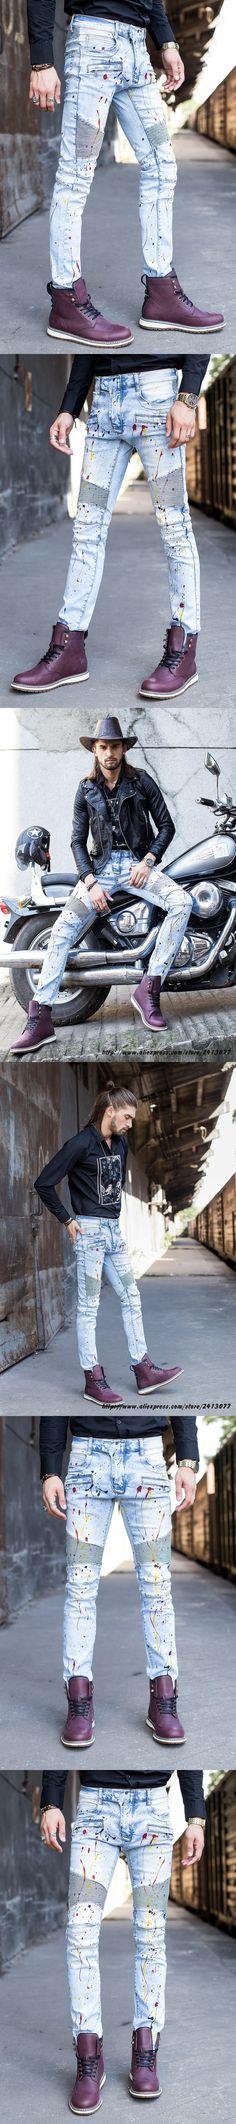 2017 new High Quality Design Fashion Men's Classic Jeans Straight Full Length Casual Jeans Men Hip Hop Biker Jeans Slim Skinny J